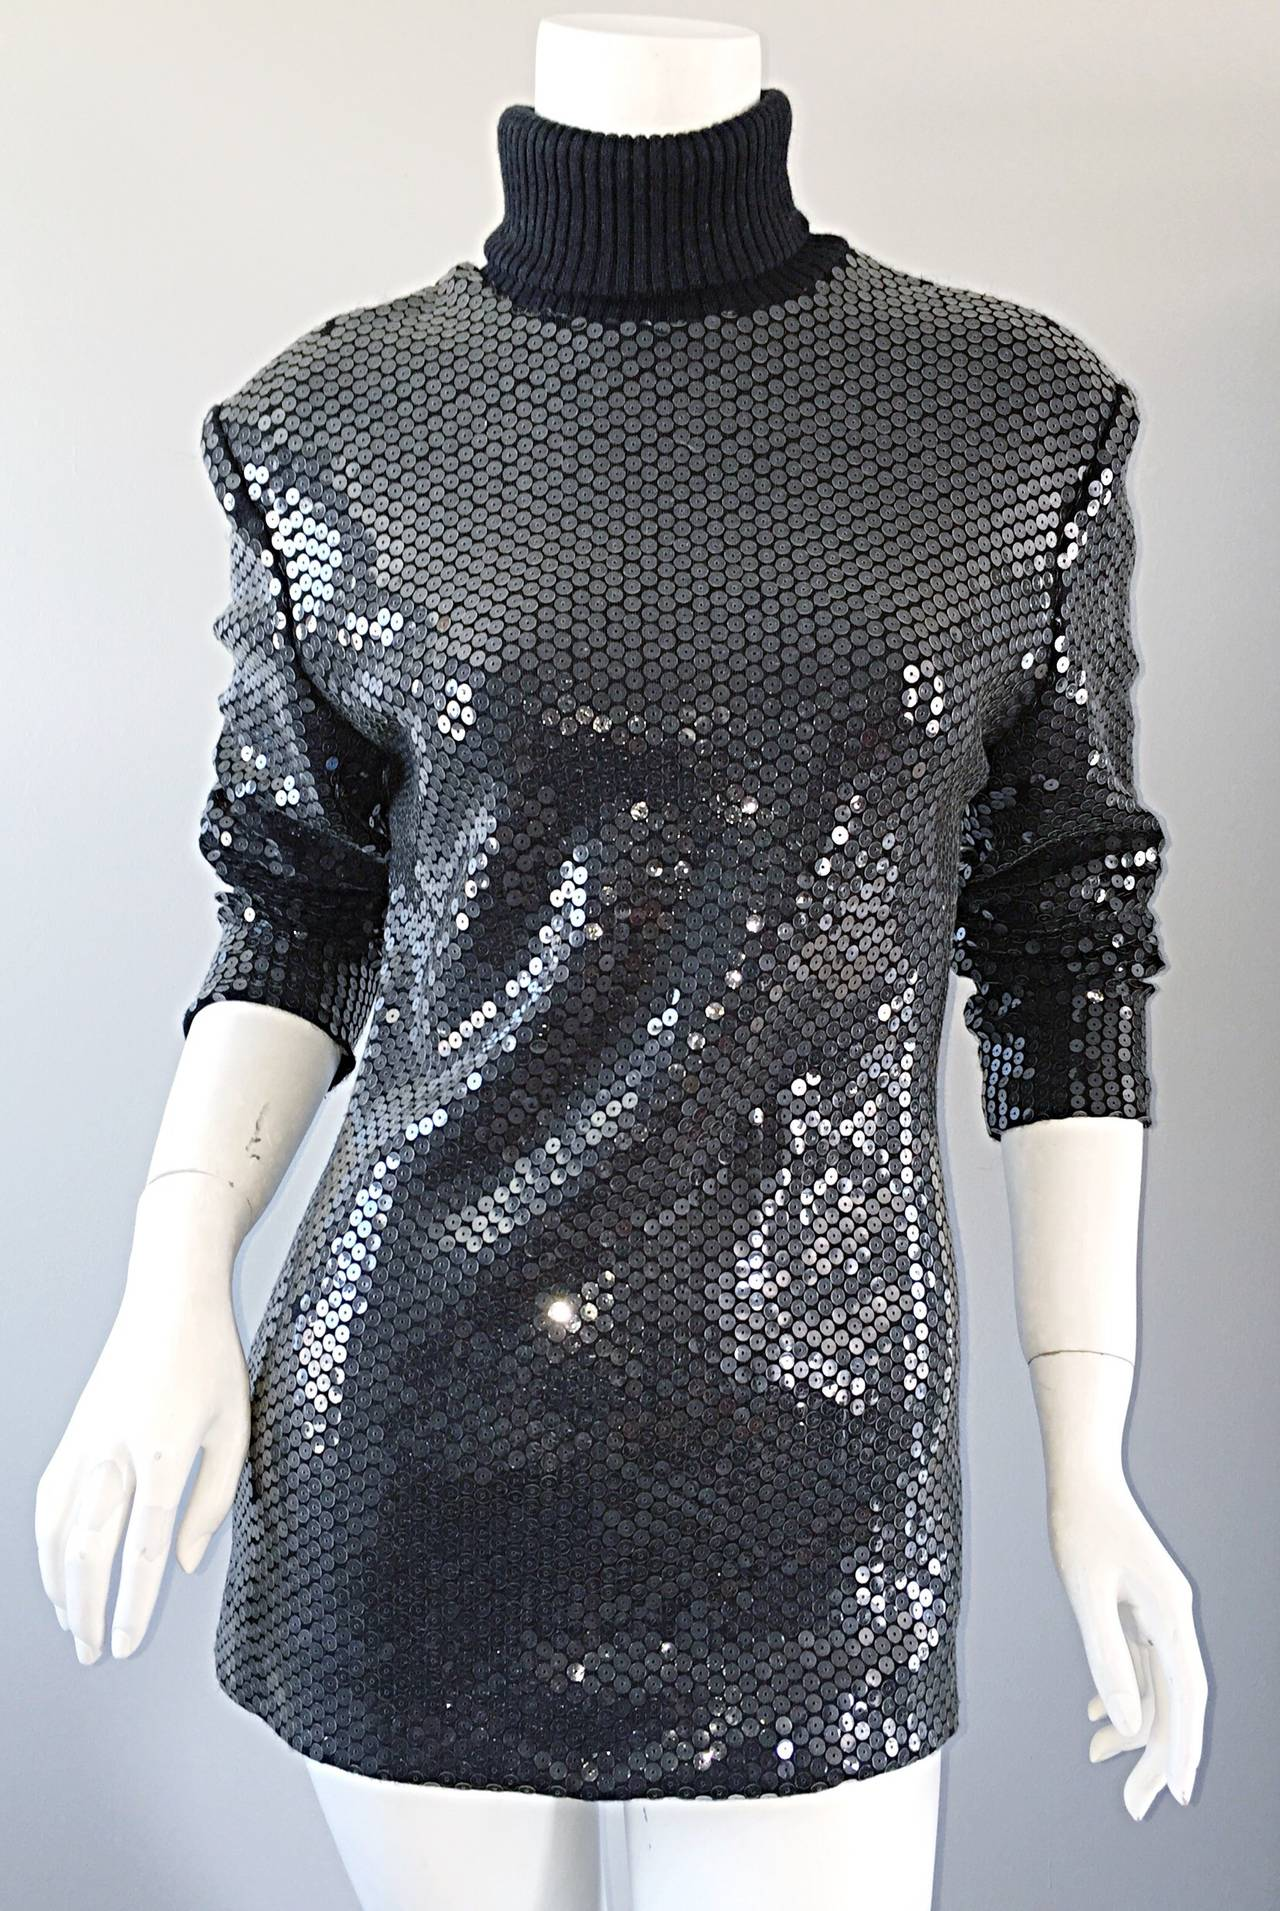 Rare Very Early Michael Kors Runway Sample Gray Sequins Turtleneck Sweater 4